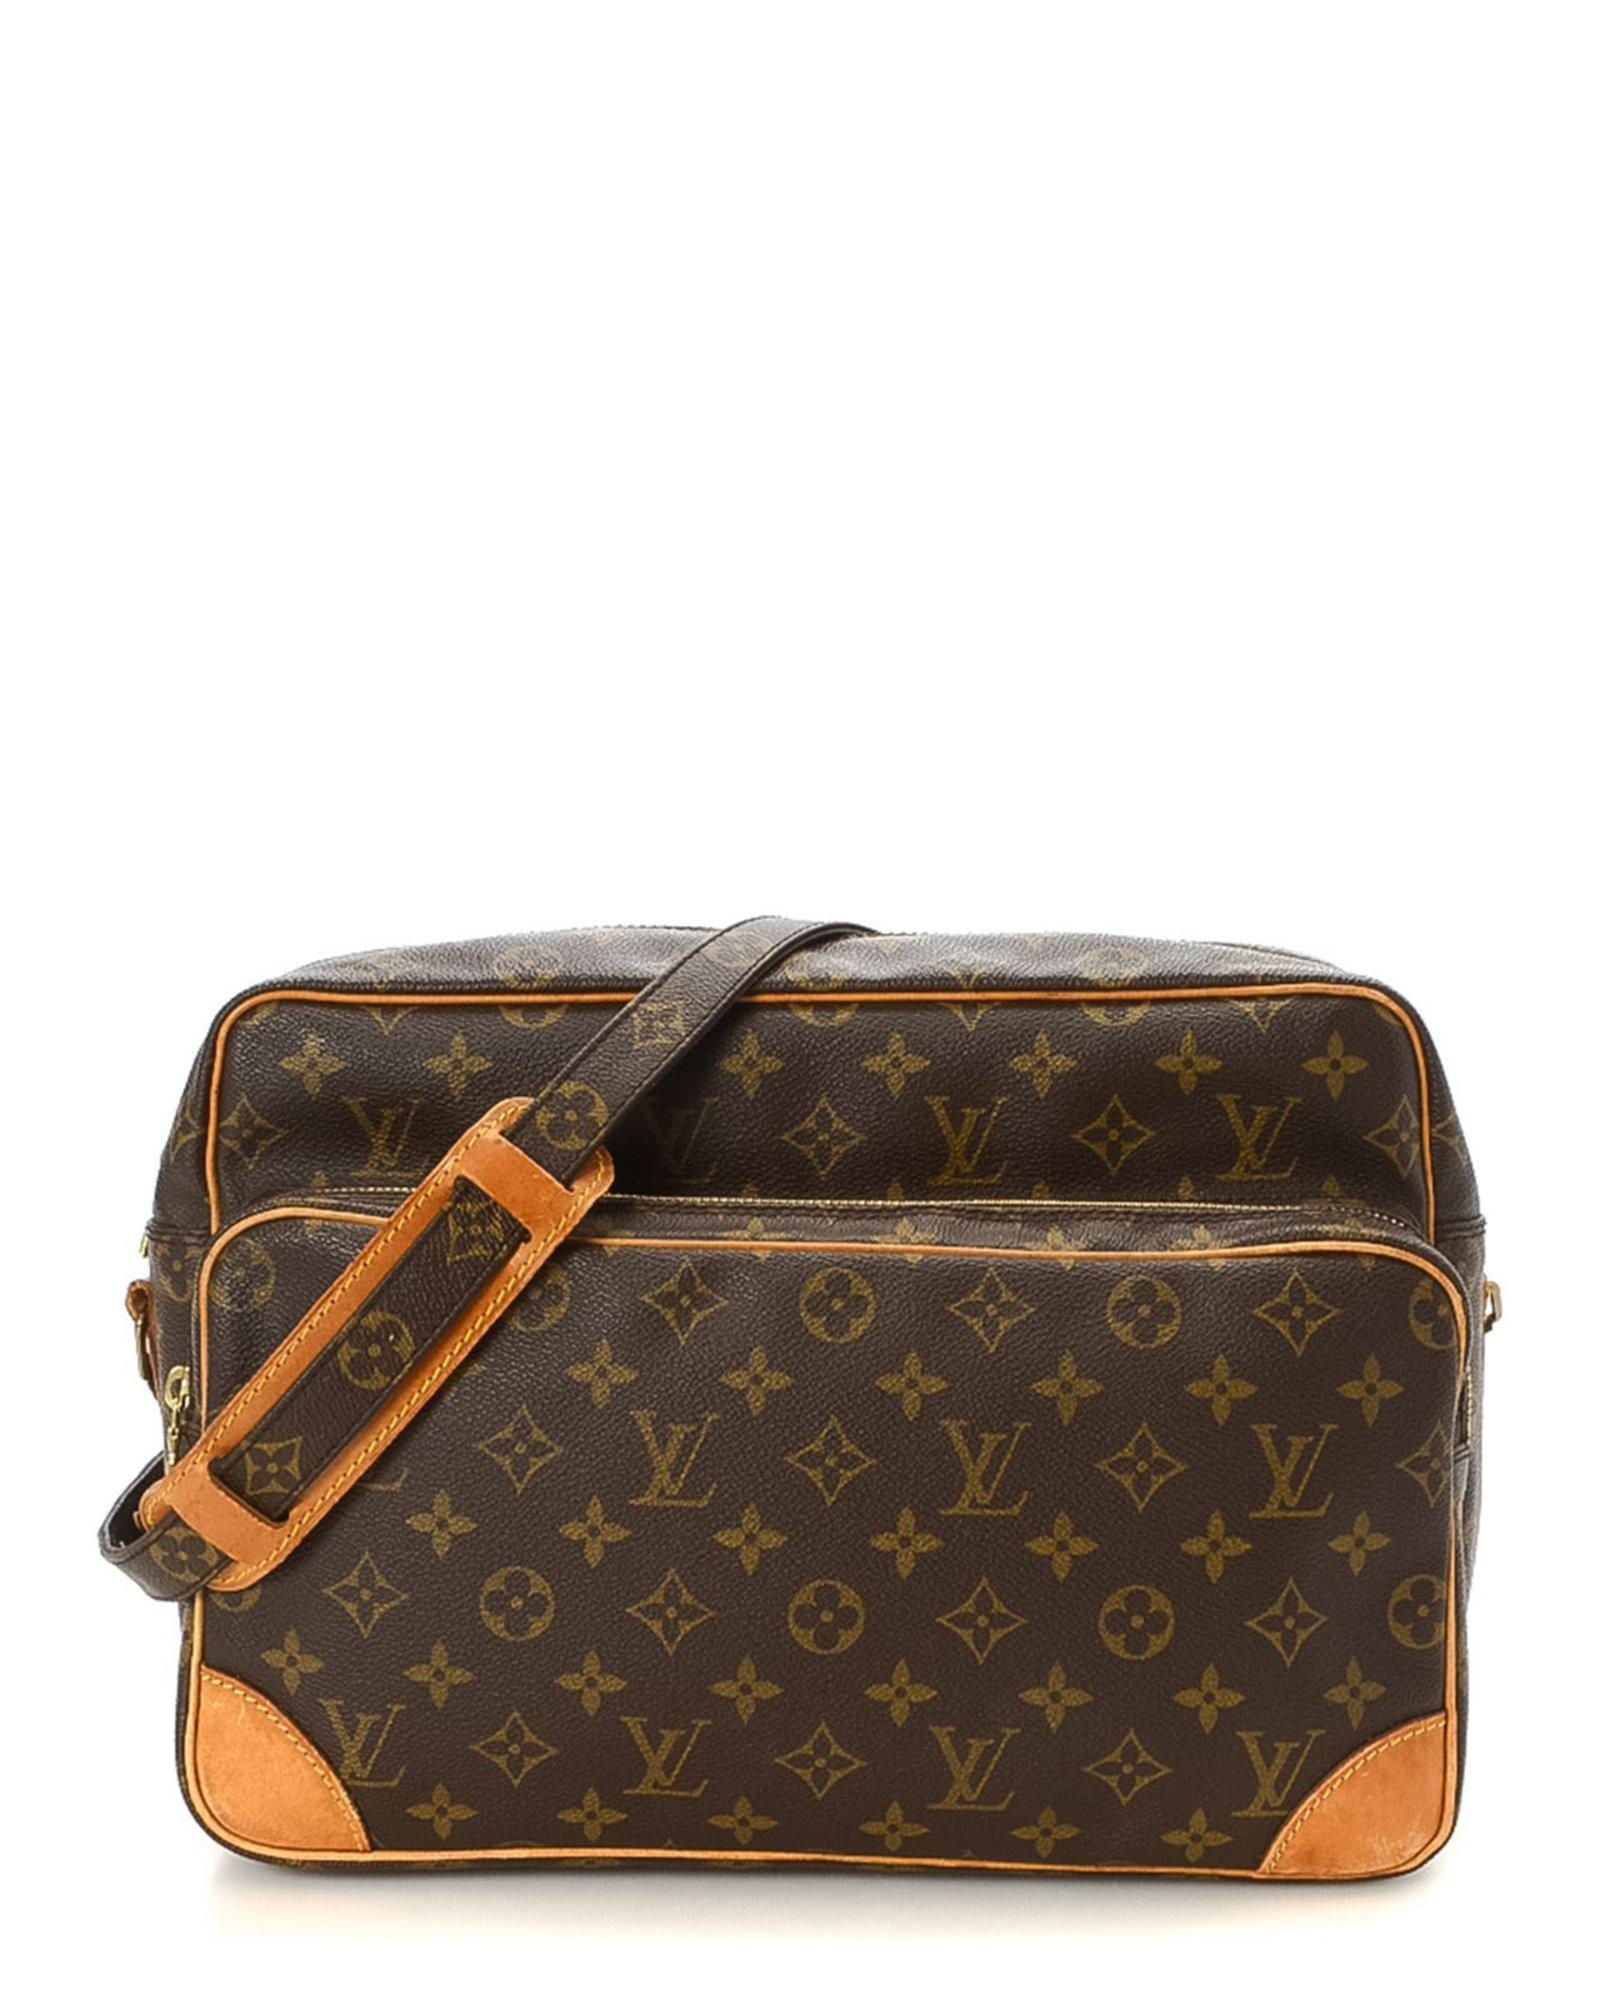 bc1b9edefe Lyst - Louis Vuitton Monogram Nil 34 Shoulder Bag - Vintage in Brown